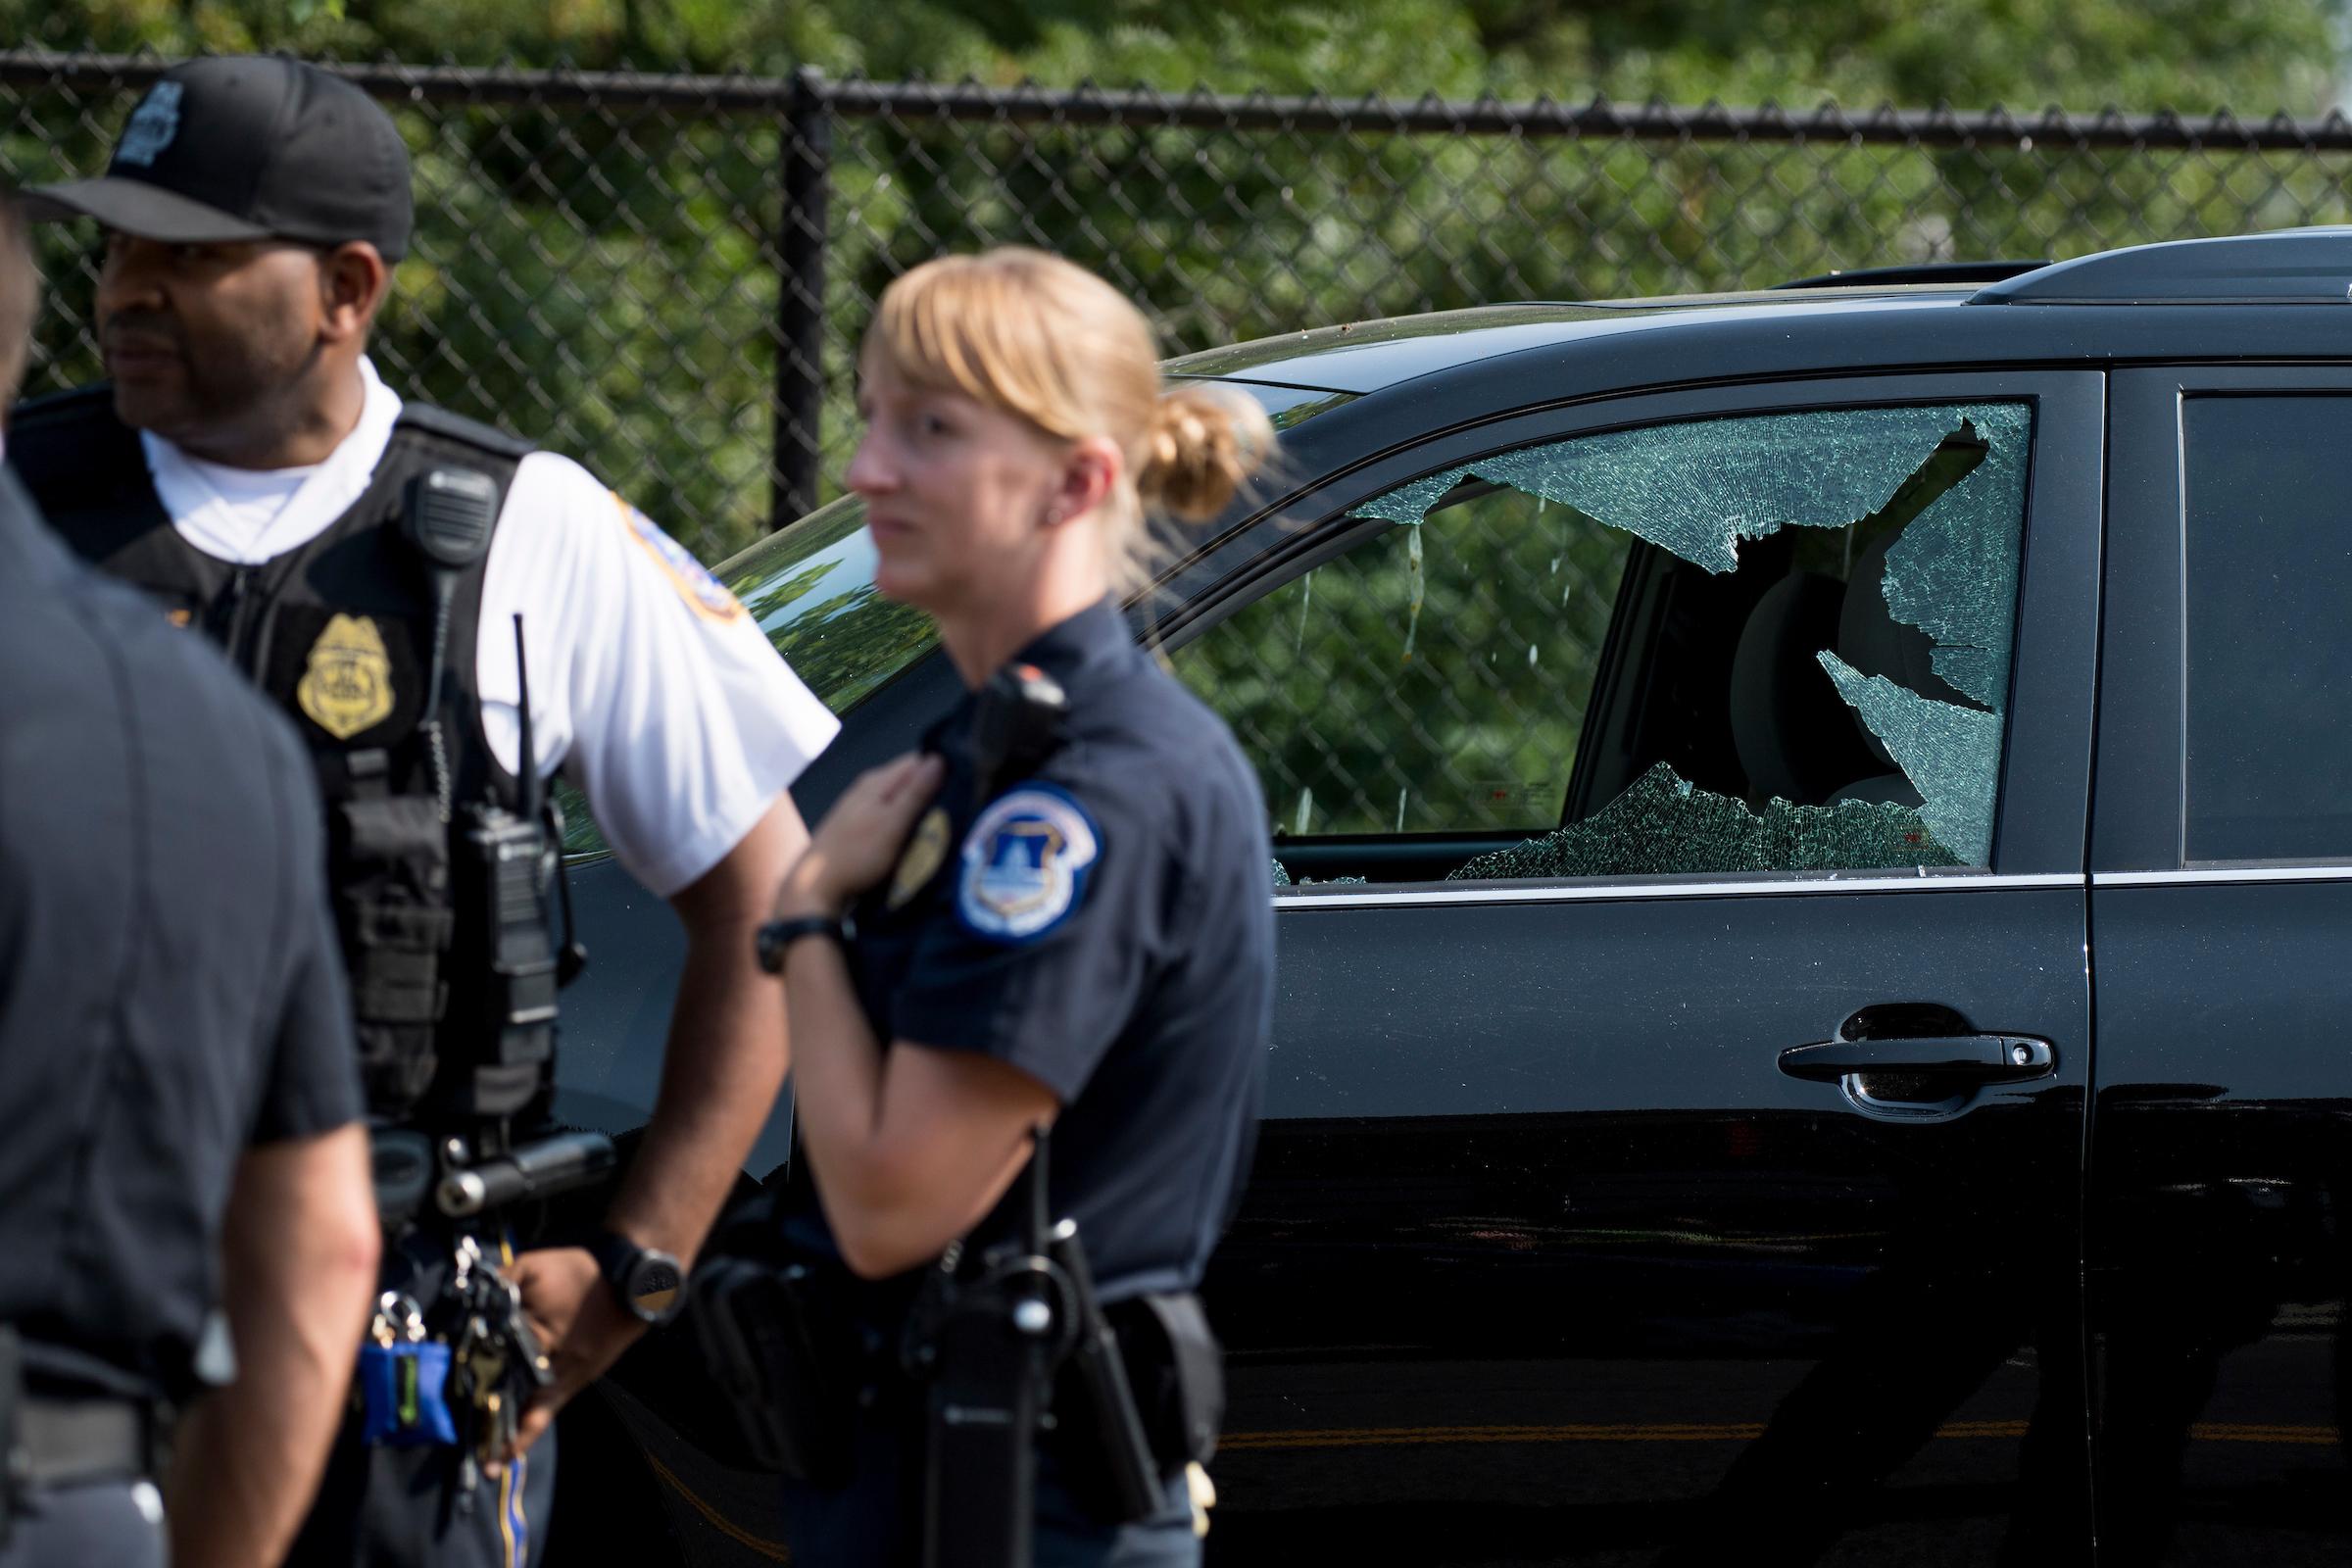 Congressional Baseball Shooting